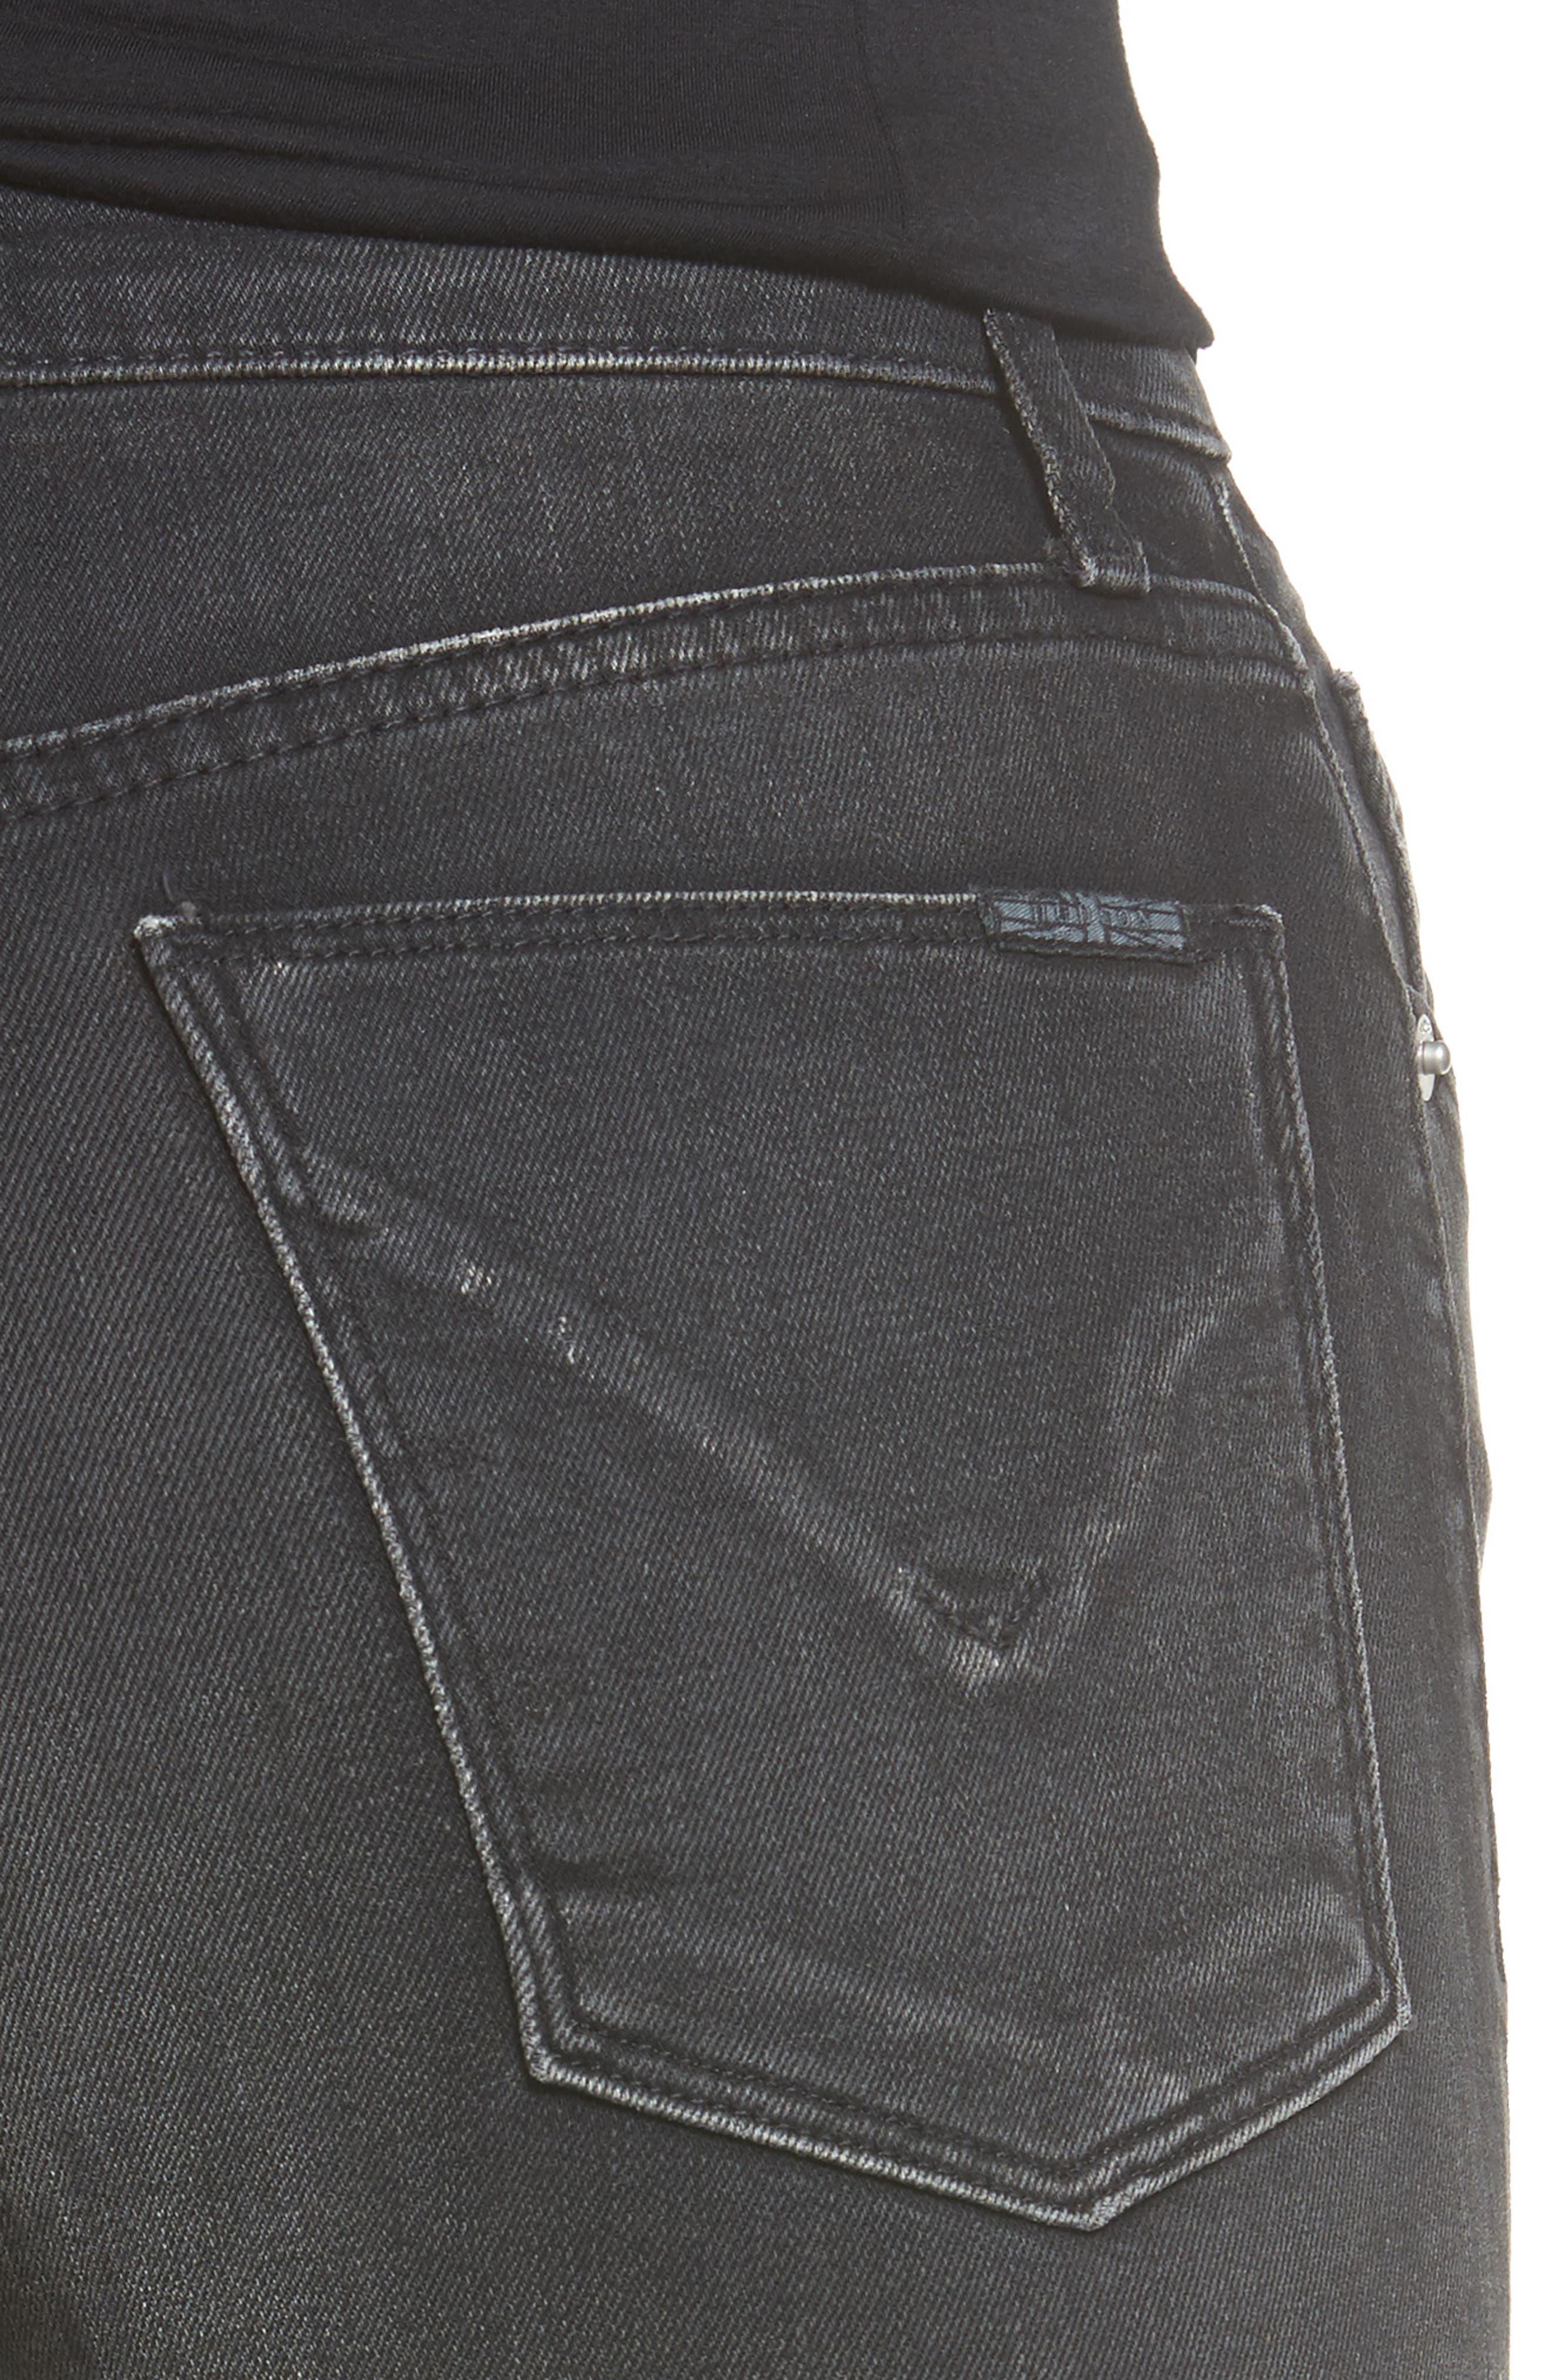 Heartbreaker High Waist Bootcut Jeans,                             Alternate thumbnail 4, color,